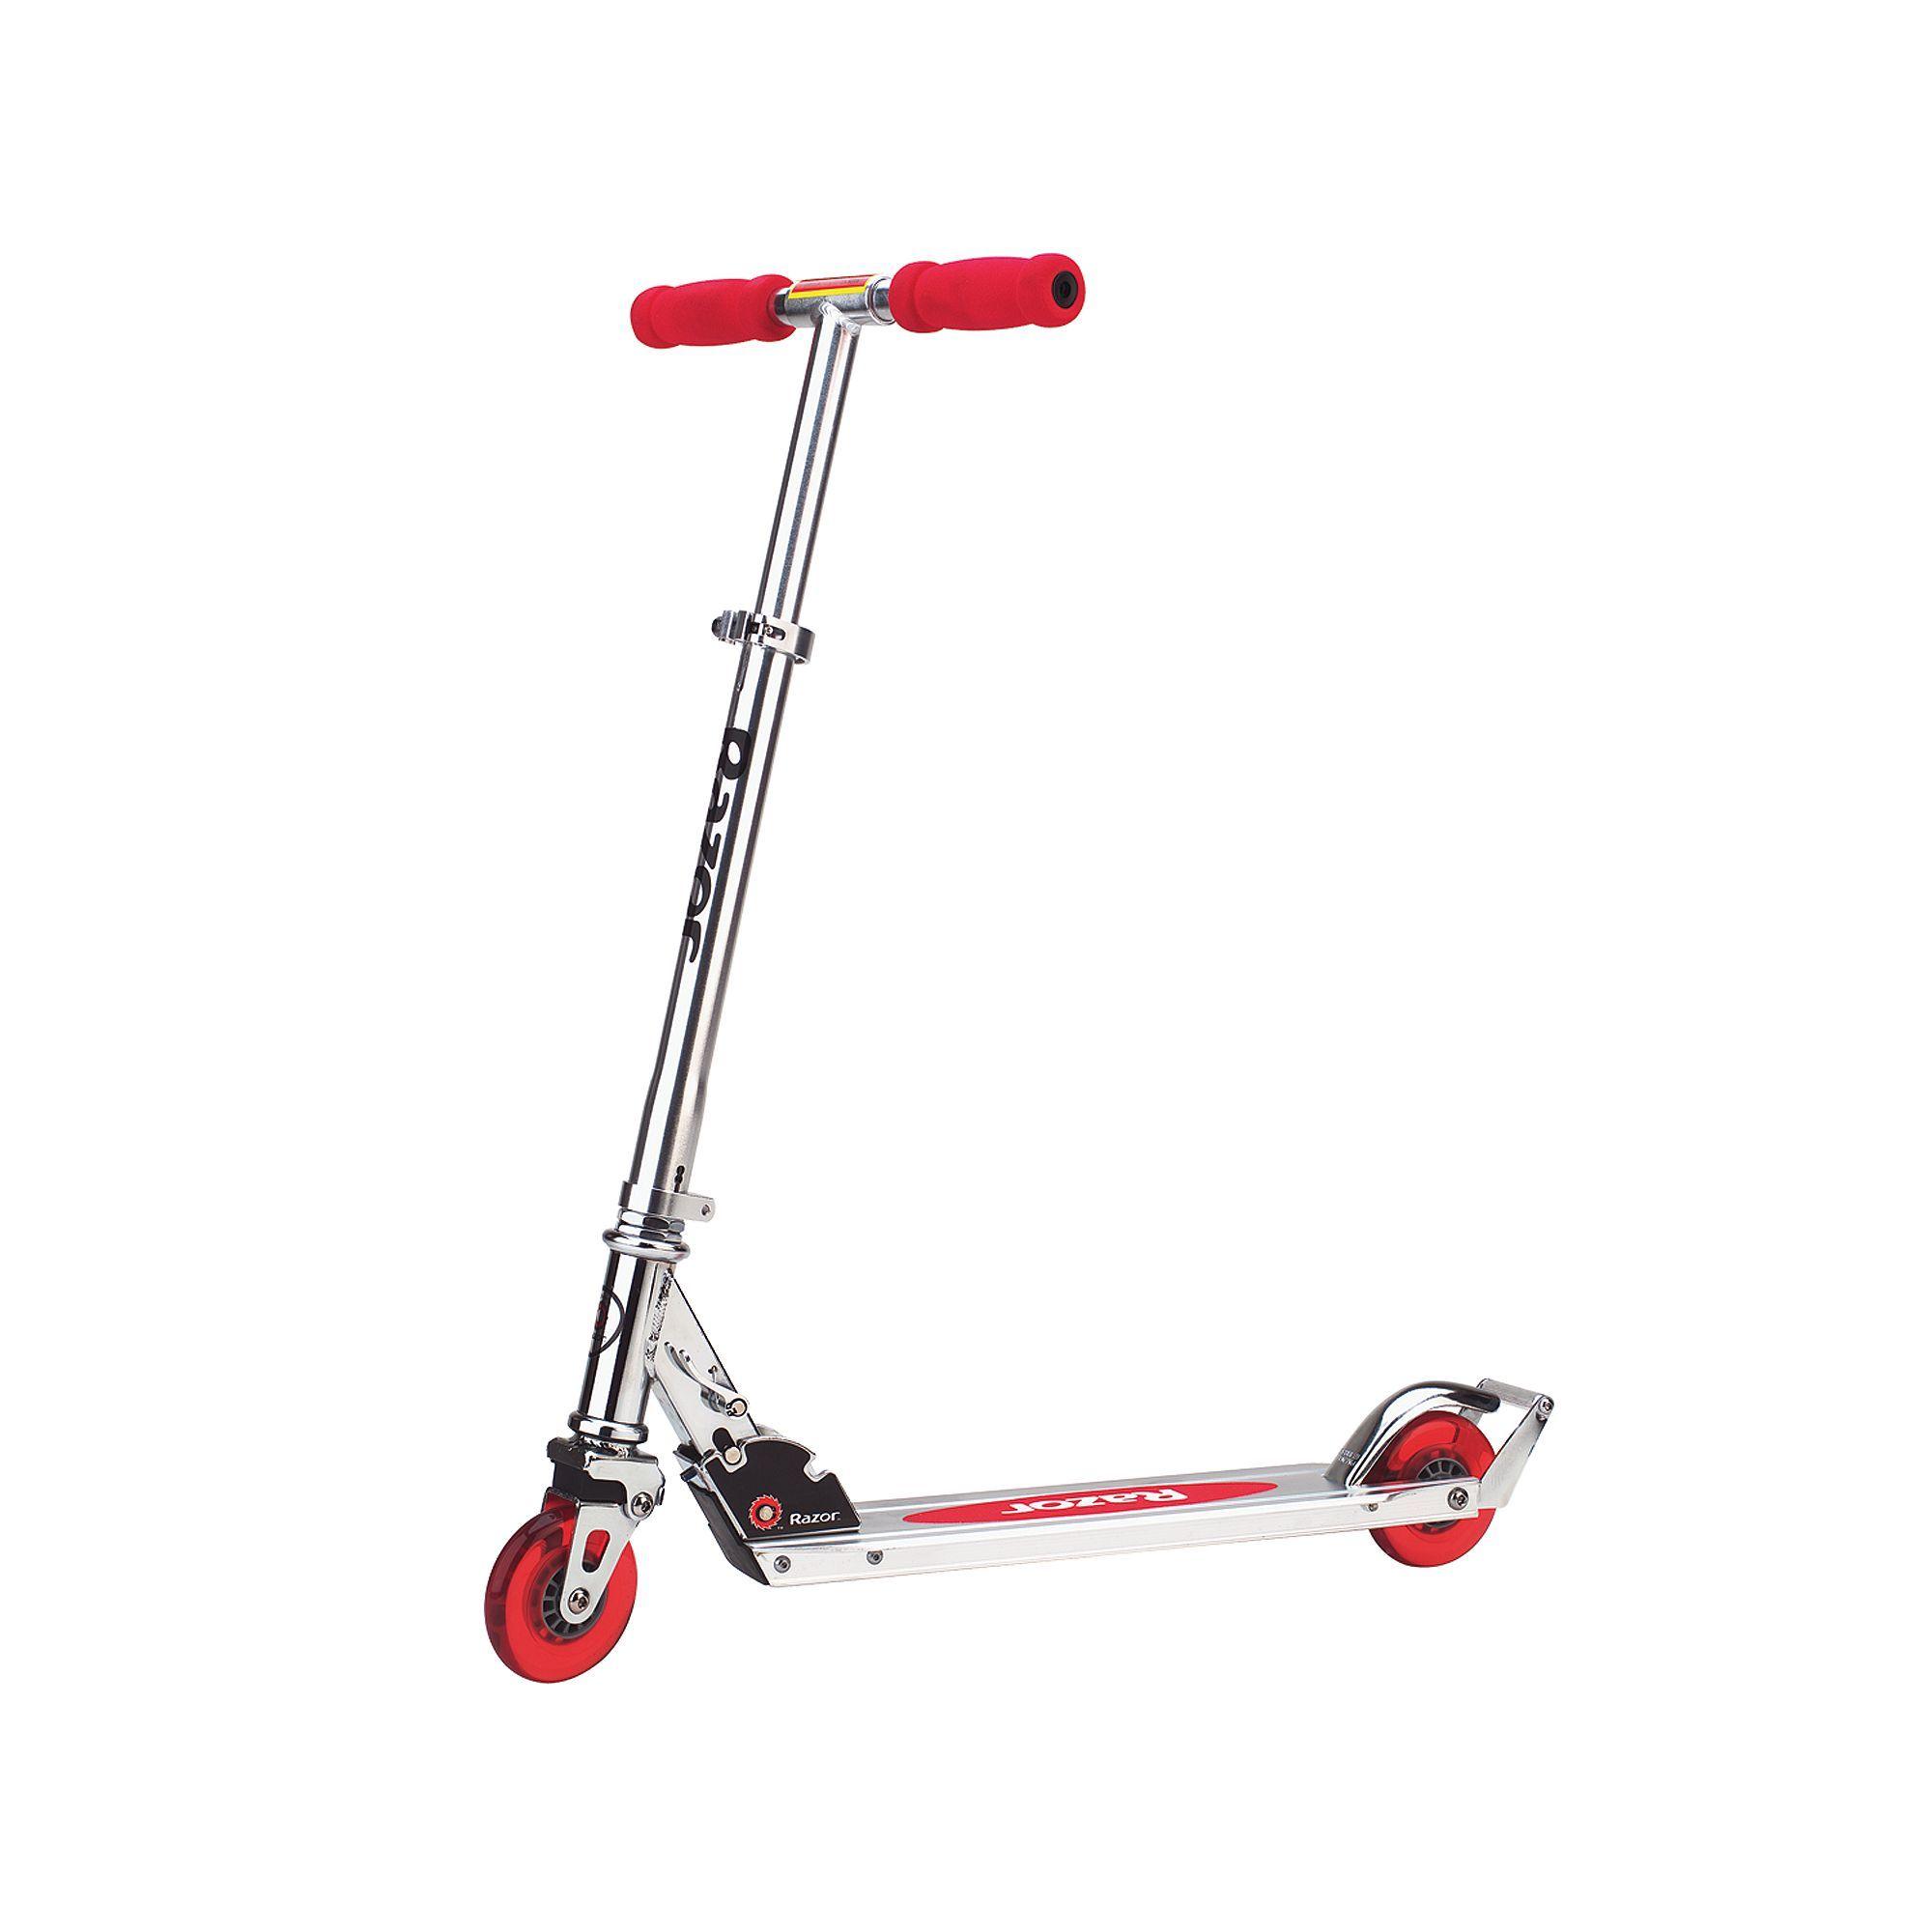 Razor A2 Kick Scooter Red